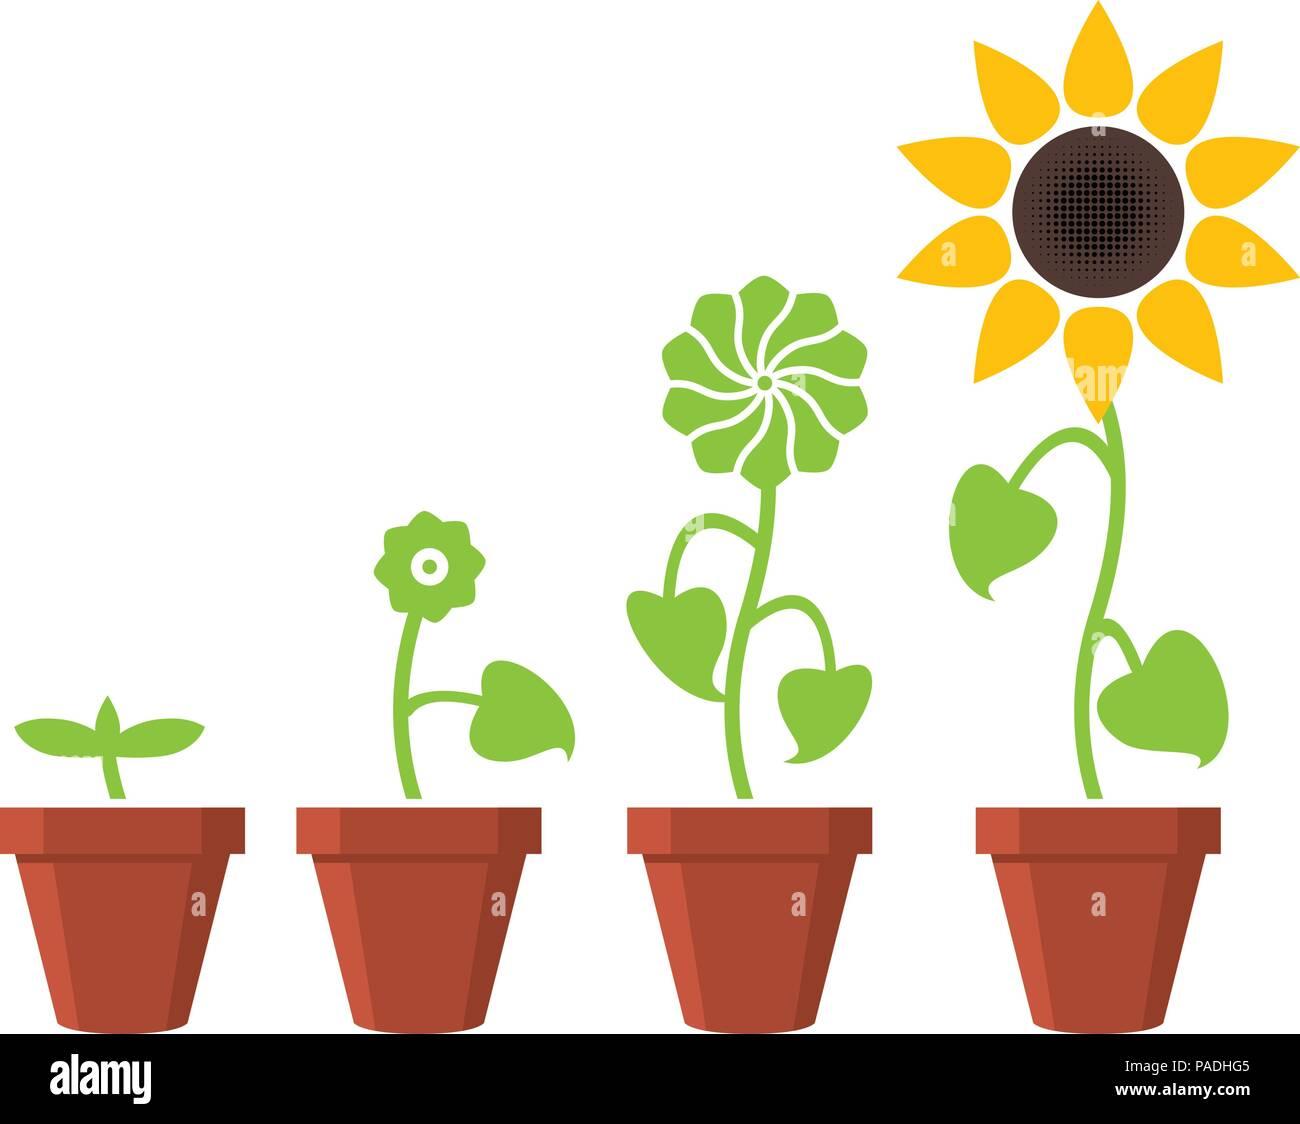 Etapas De Crecimiento De Plantas De Girasol Vector Concepto